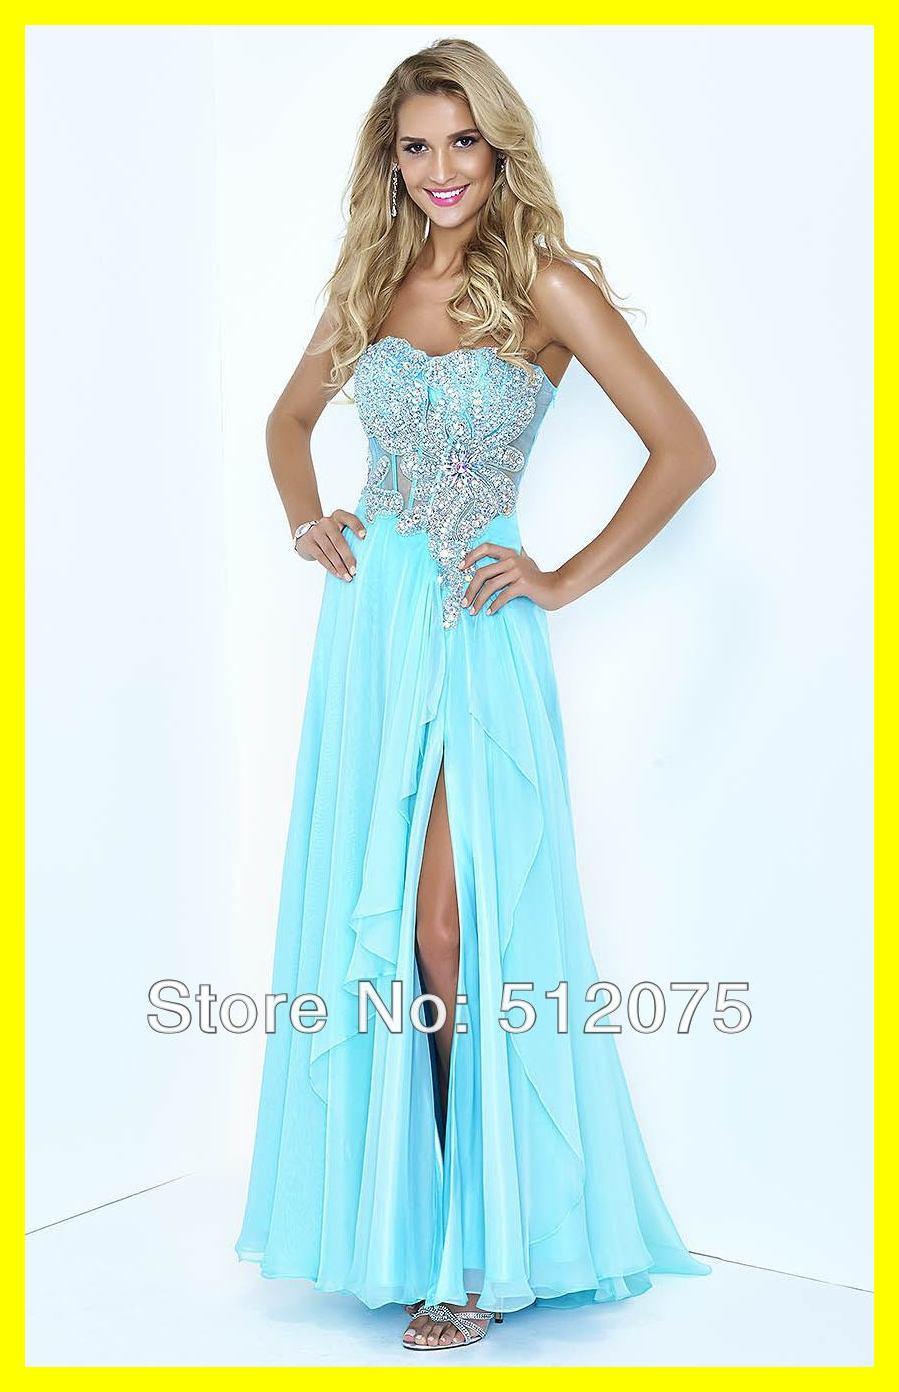 Prom Dresses Austin Tx Shop Top America Plus Size On Sale A ...